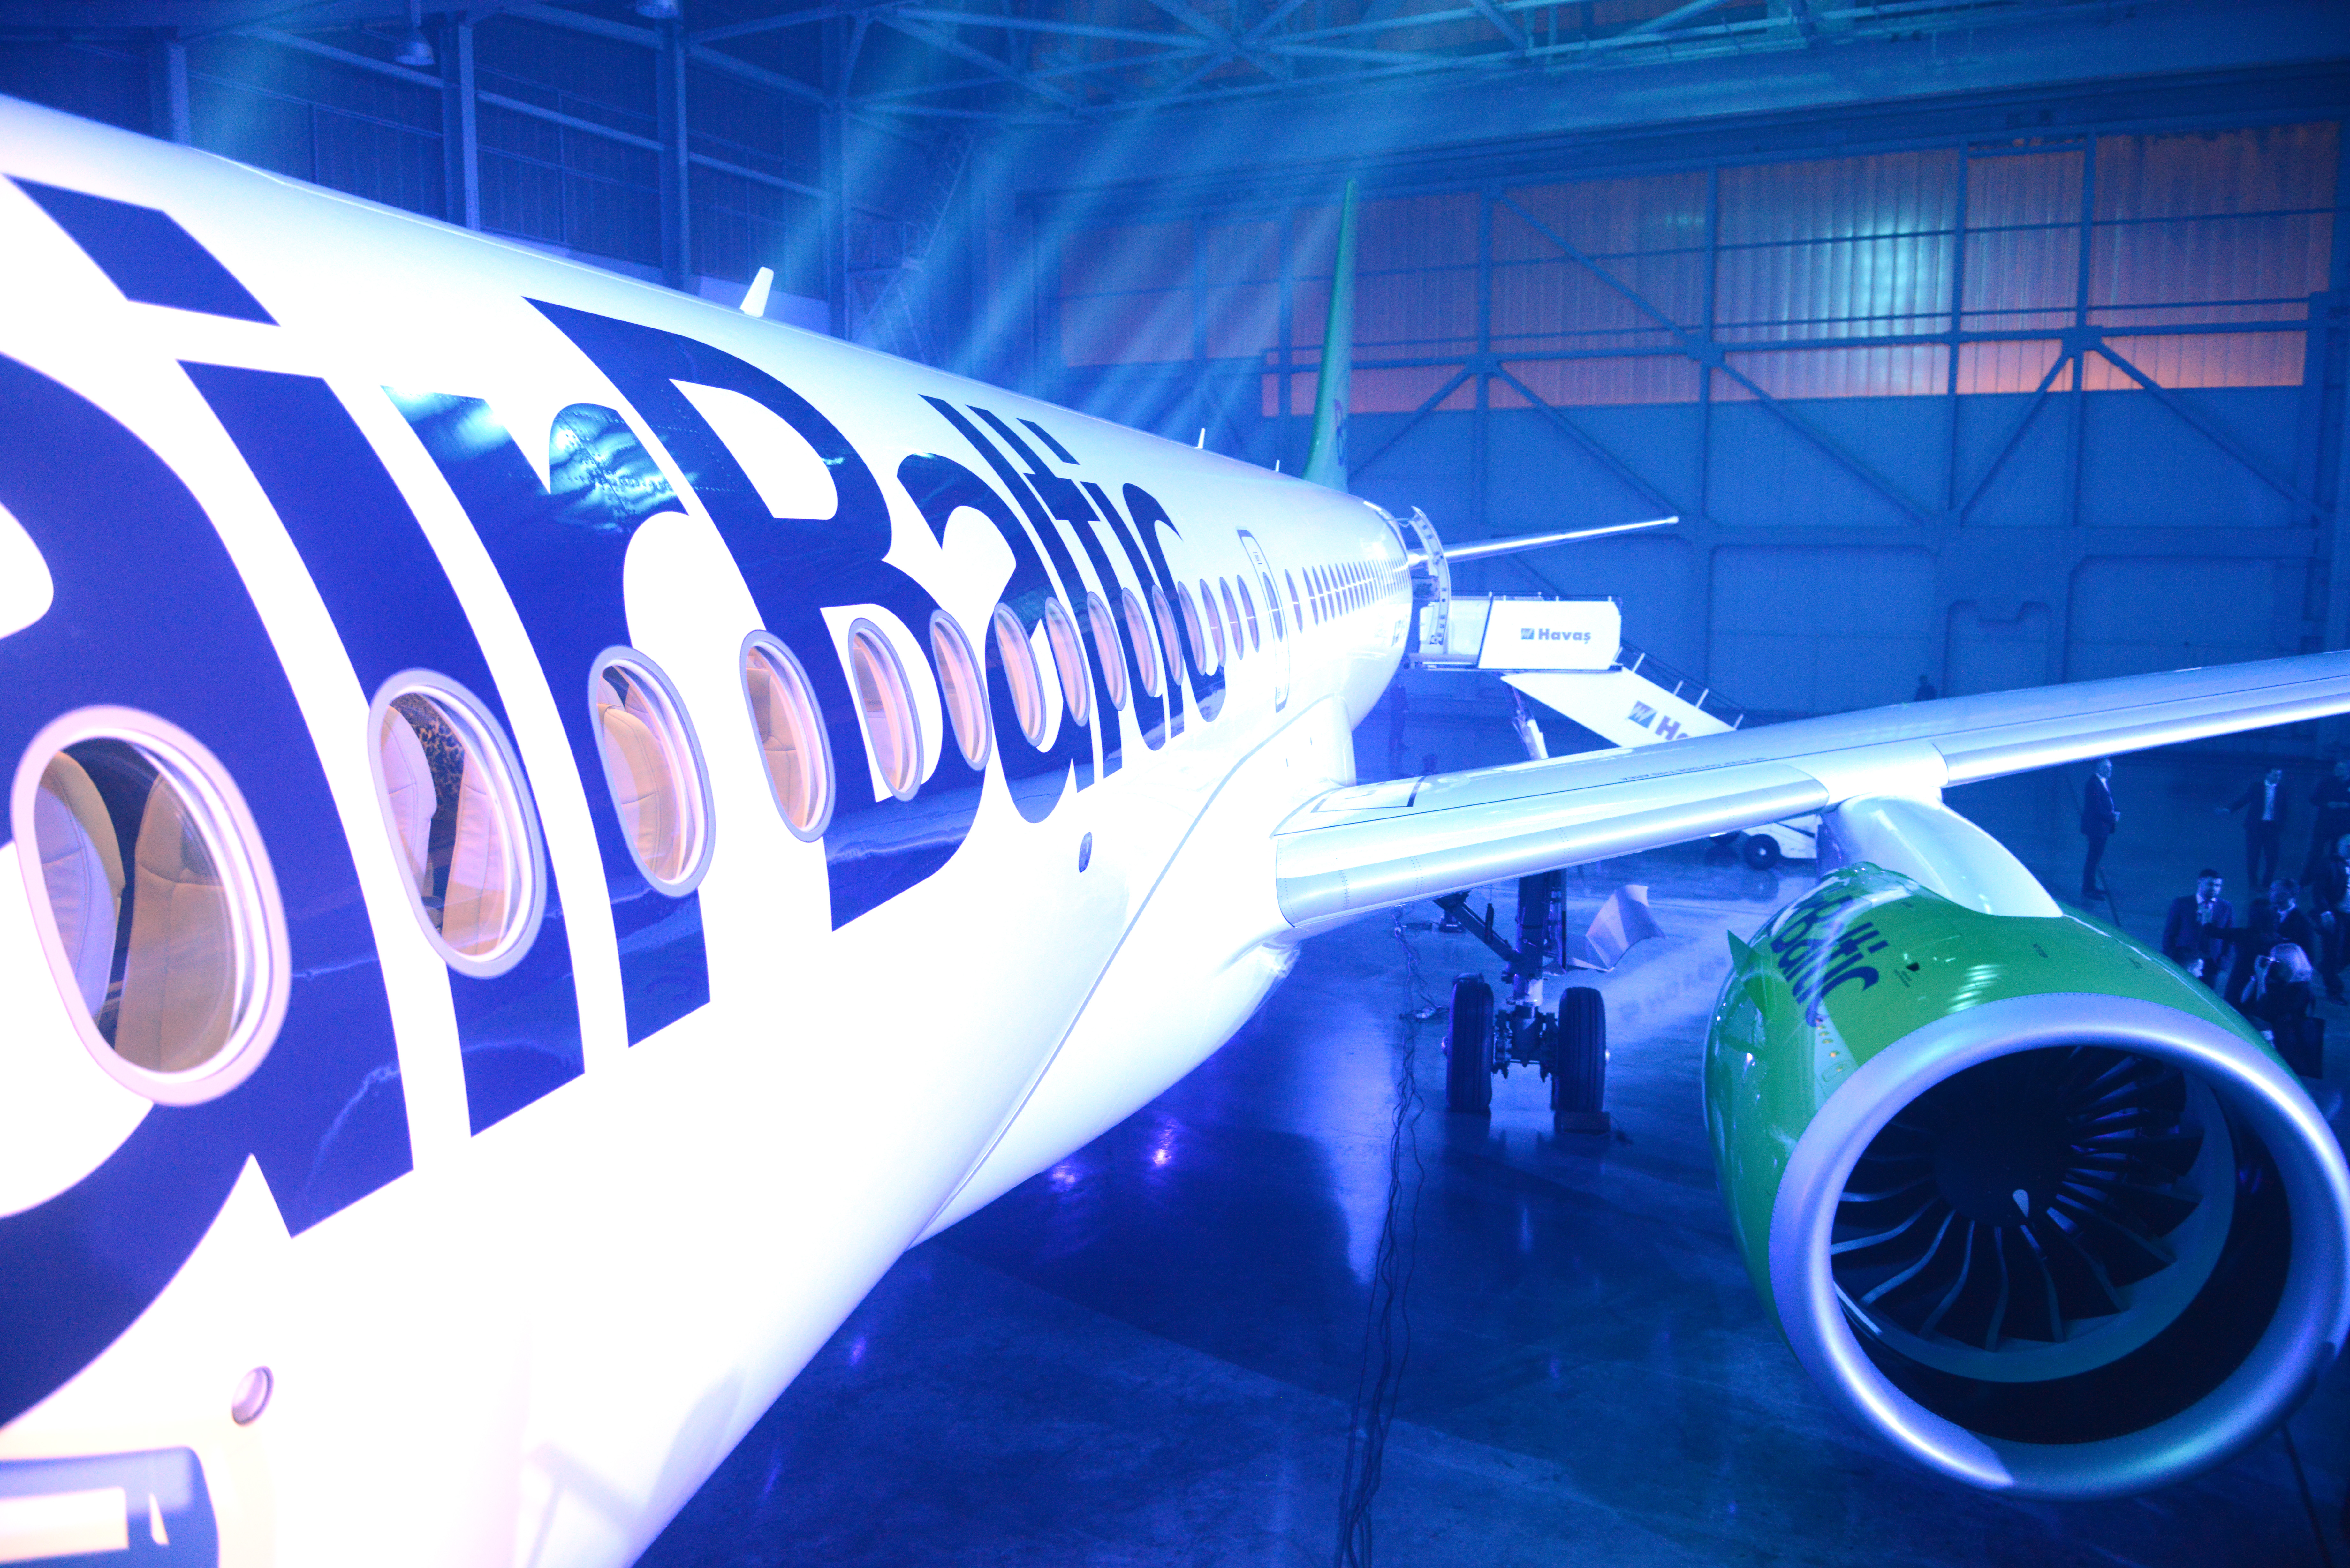 AirBaltics Bombardier CS300 blev afsløret ved et stort releaseparty i december 2016. (Foto: Joakim J. Hvistendahl)